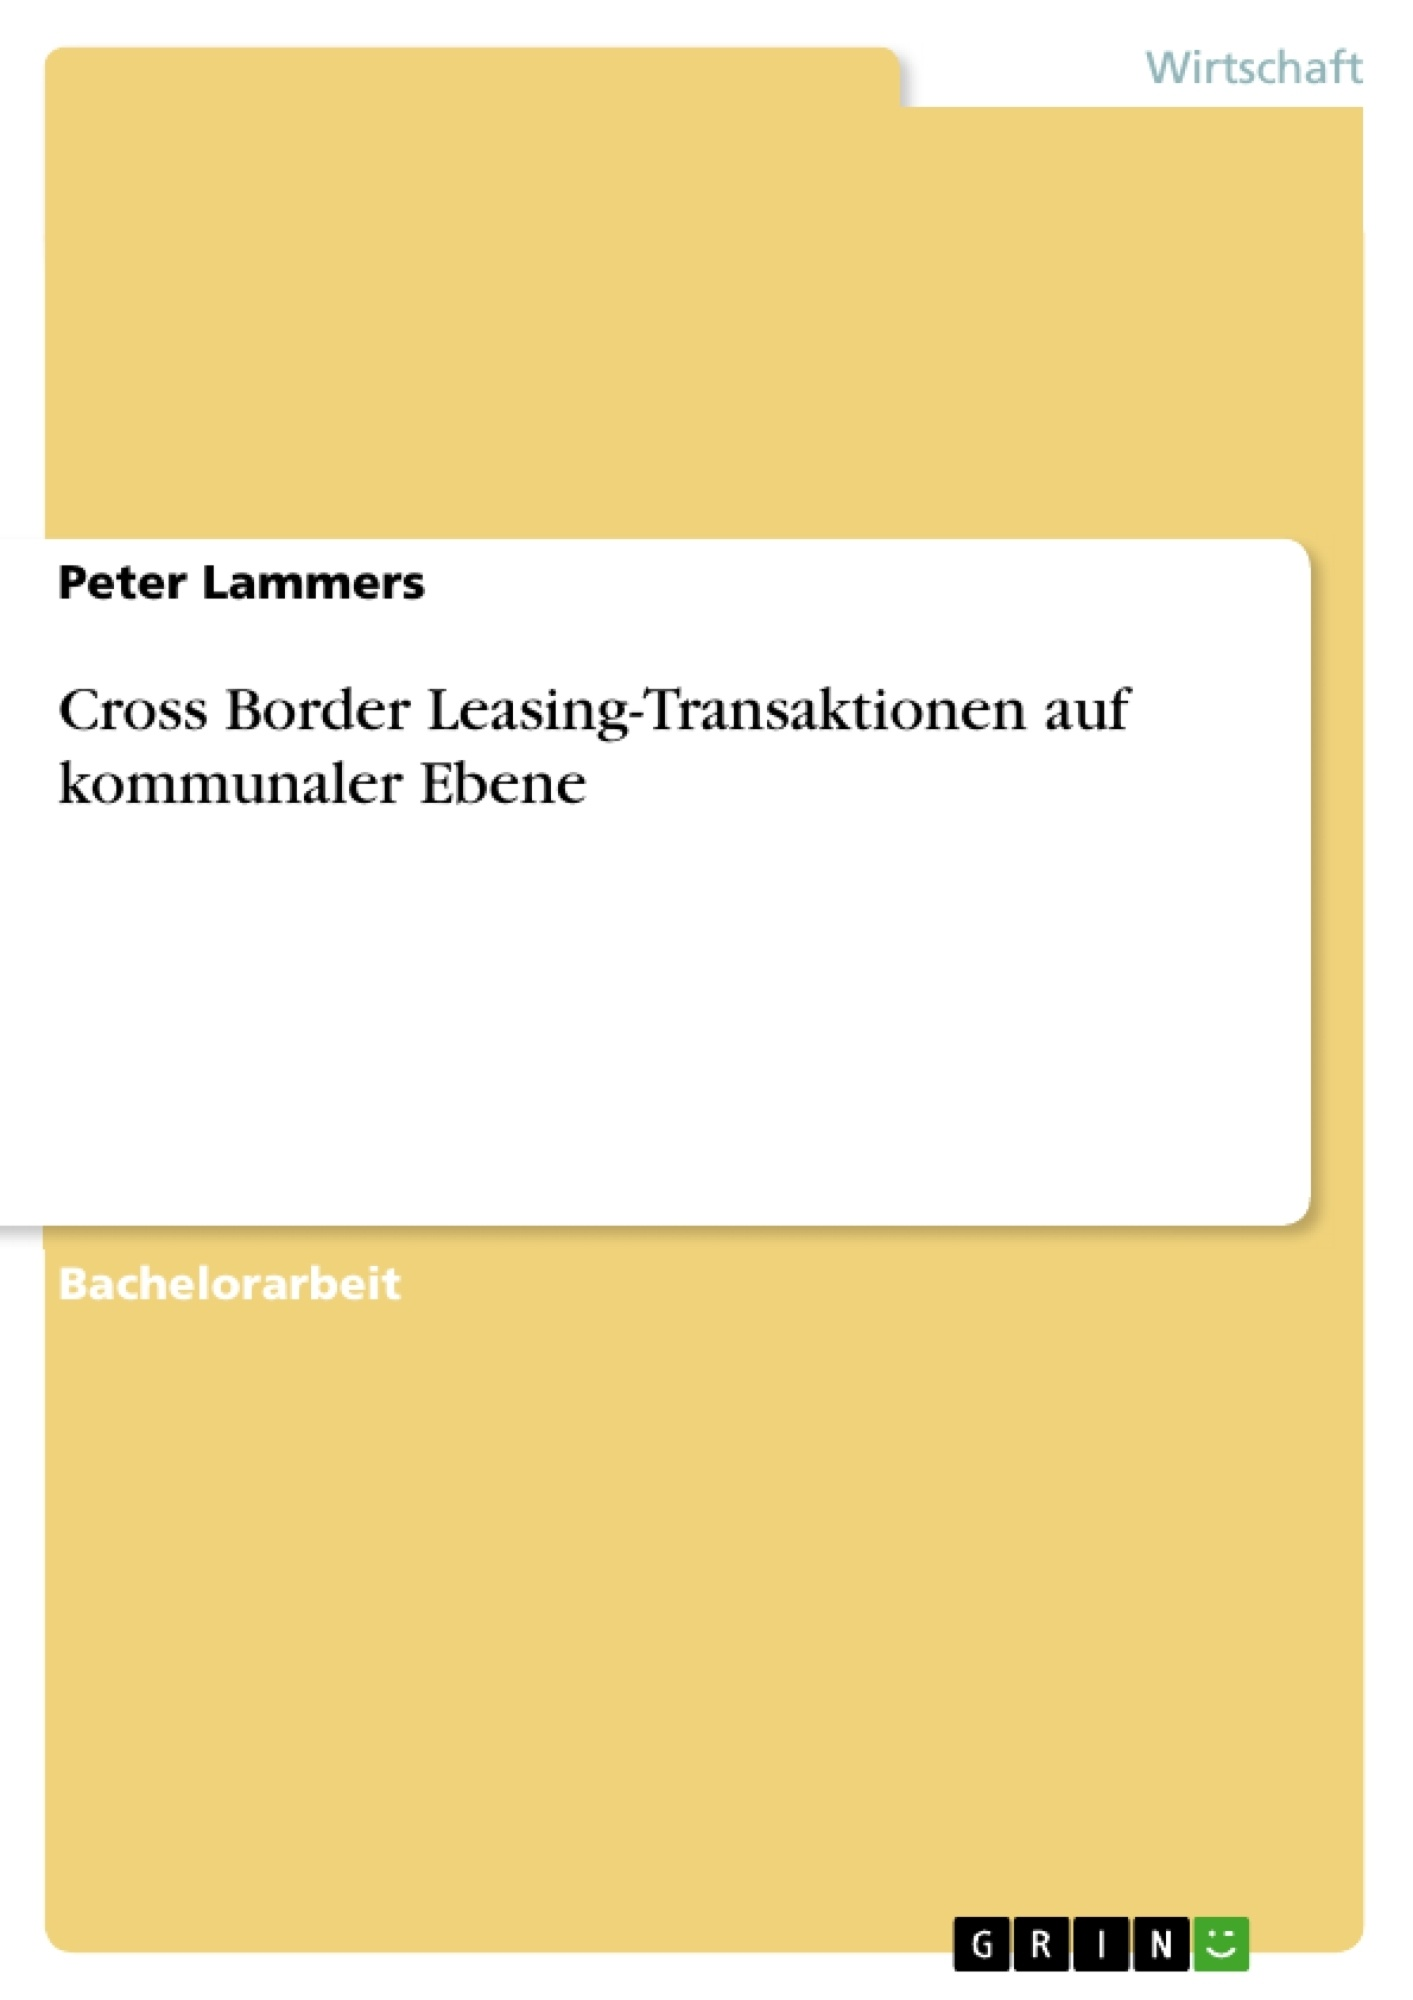 Titel: Cross Border Leasing-Transaktionen auf kommunaler Ebene